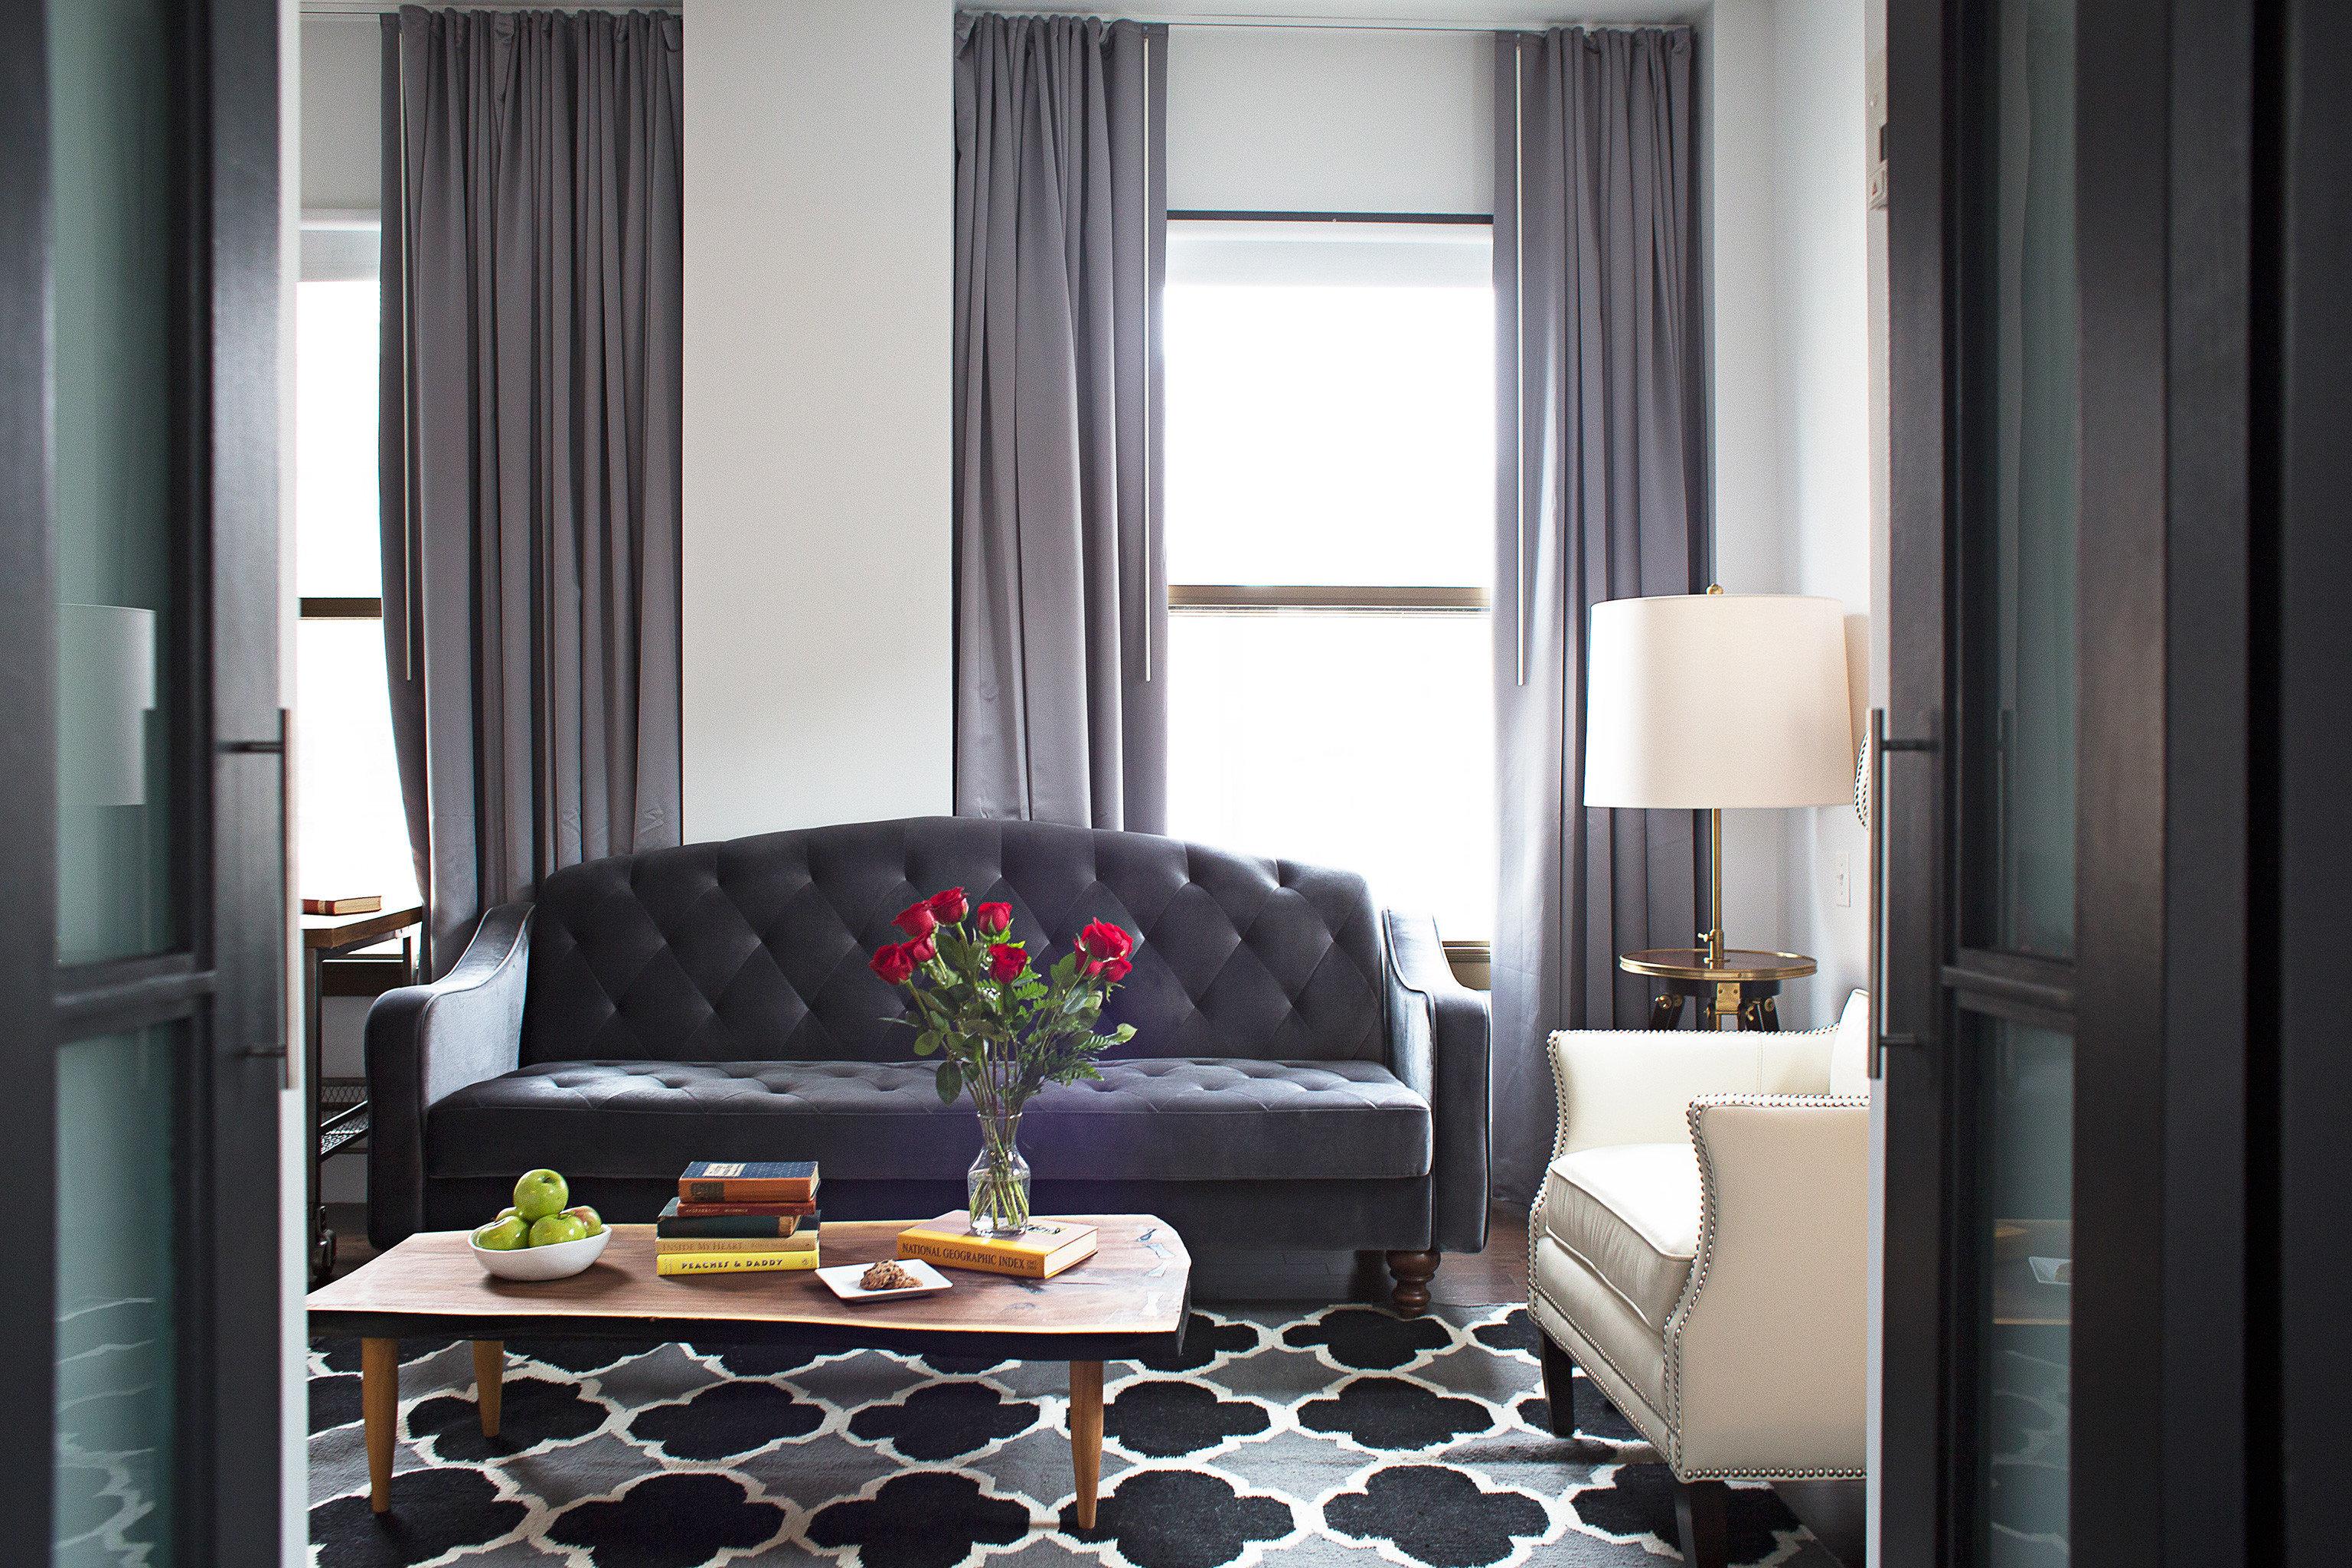 City Lounge Modern Suite property living room curtain home cottage window treatment textile Bedroom condominium